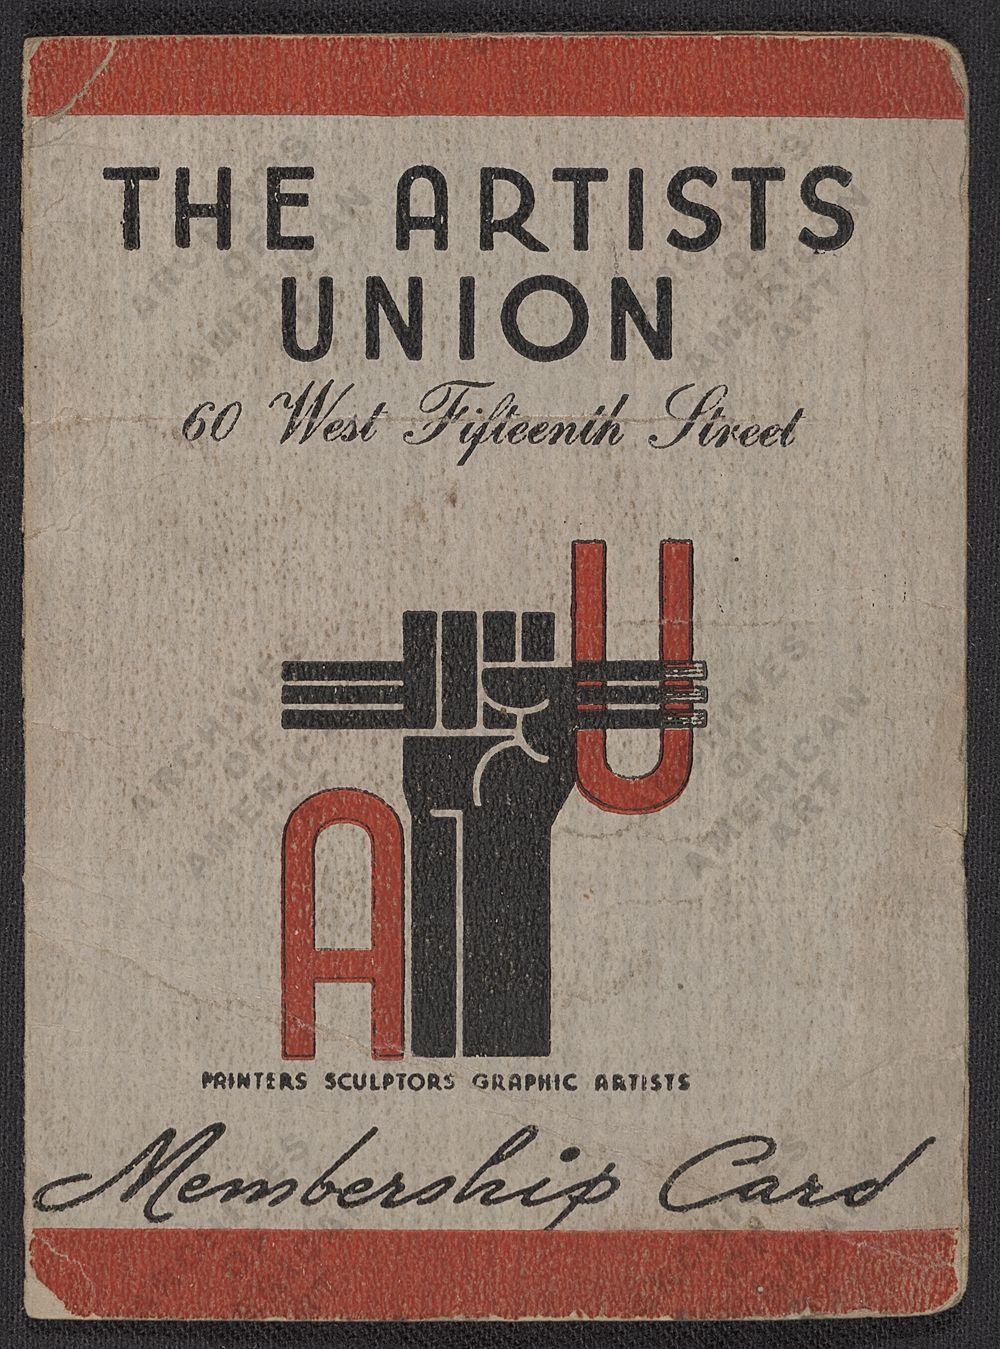 "Prednja strana članske iskaznice američkog sindikata umjetnika iz 1935. godine (izvor: <a href=""http://www.aaa.si.edu/collections/viewer/harry-gottliebs-artists-union-membership-card-11632"" target=""_blank"">Smithsonianov arhiv američke umjetnosti</a> prema <a href=""http://www.si.edu/termsofuse/"" target=""_blank"">Fair Use</a> licenci)."